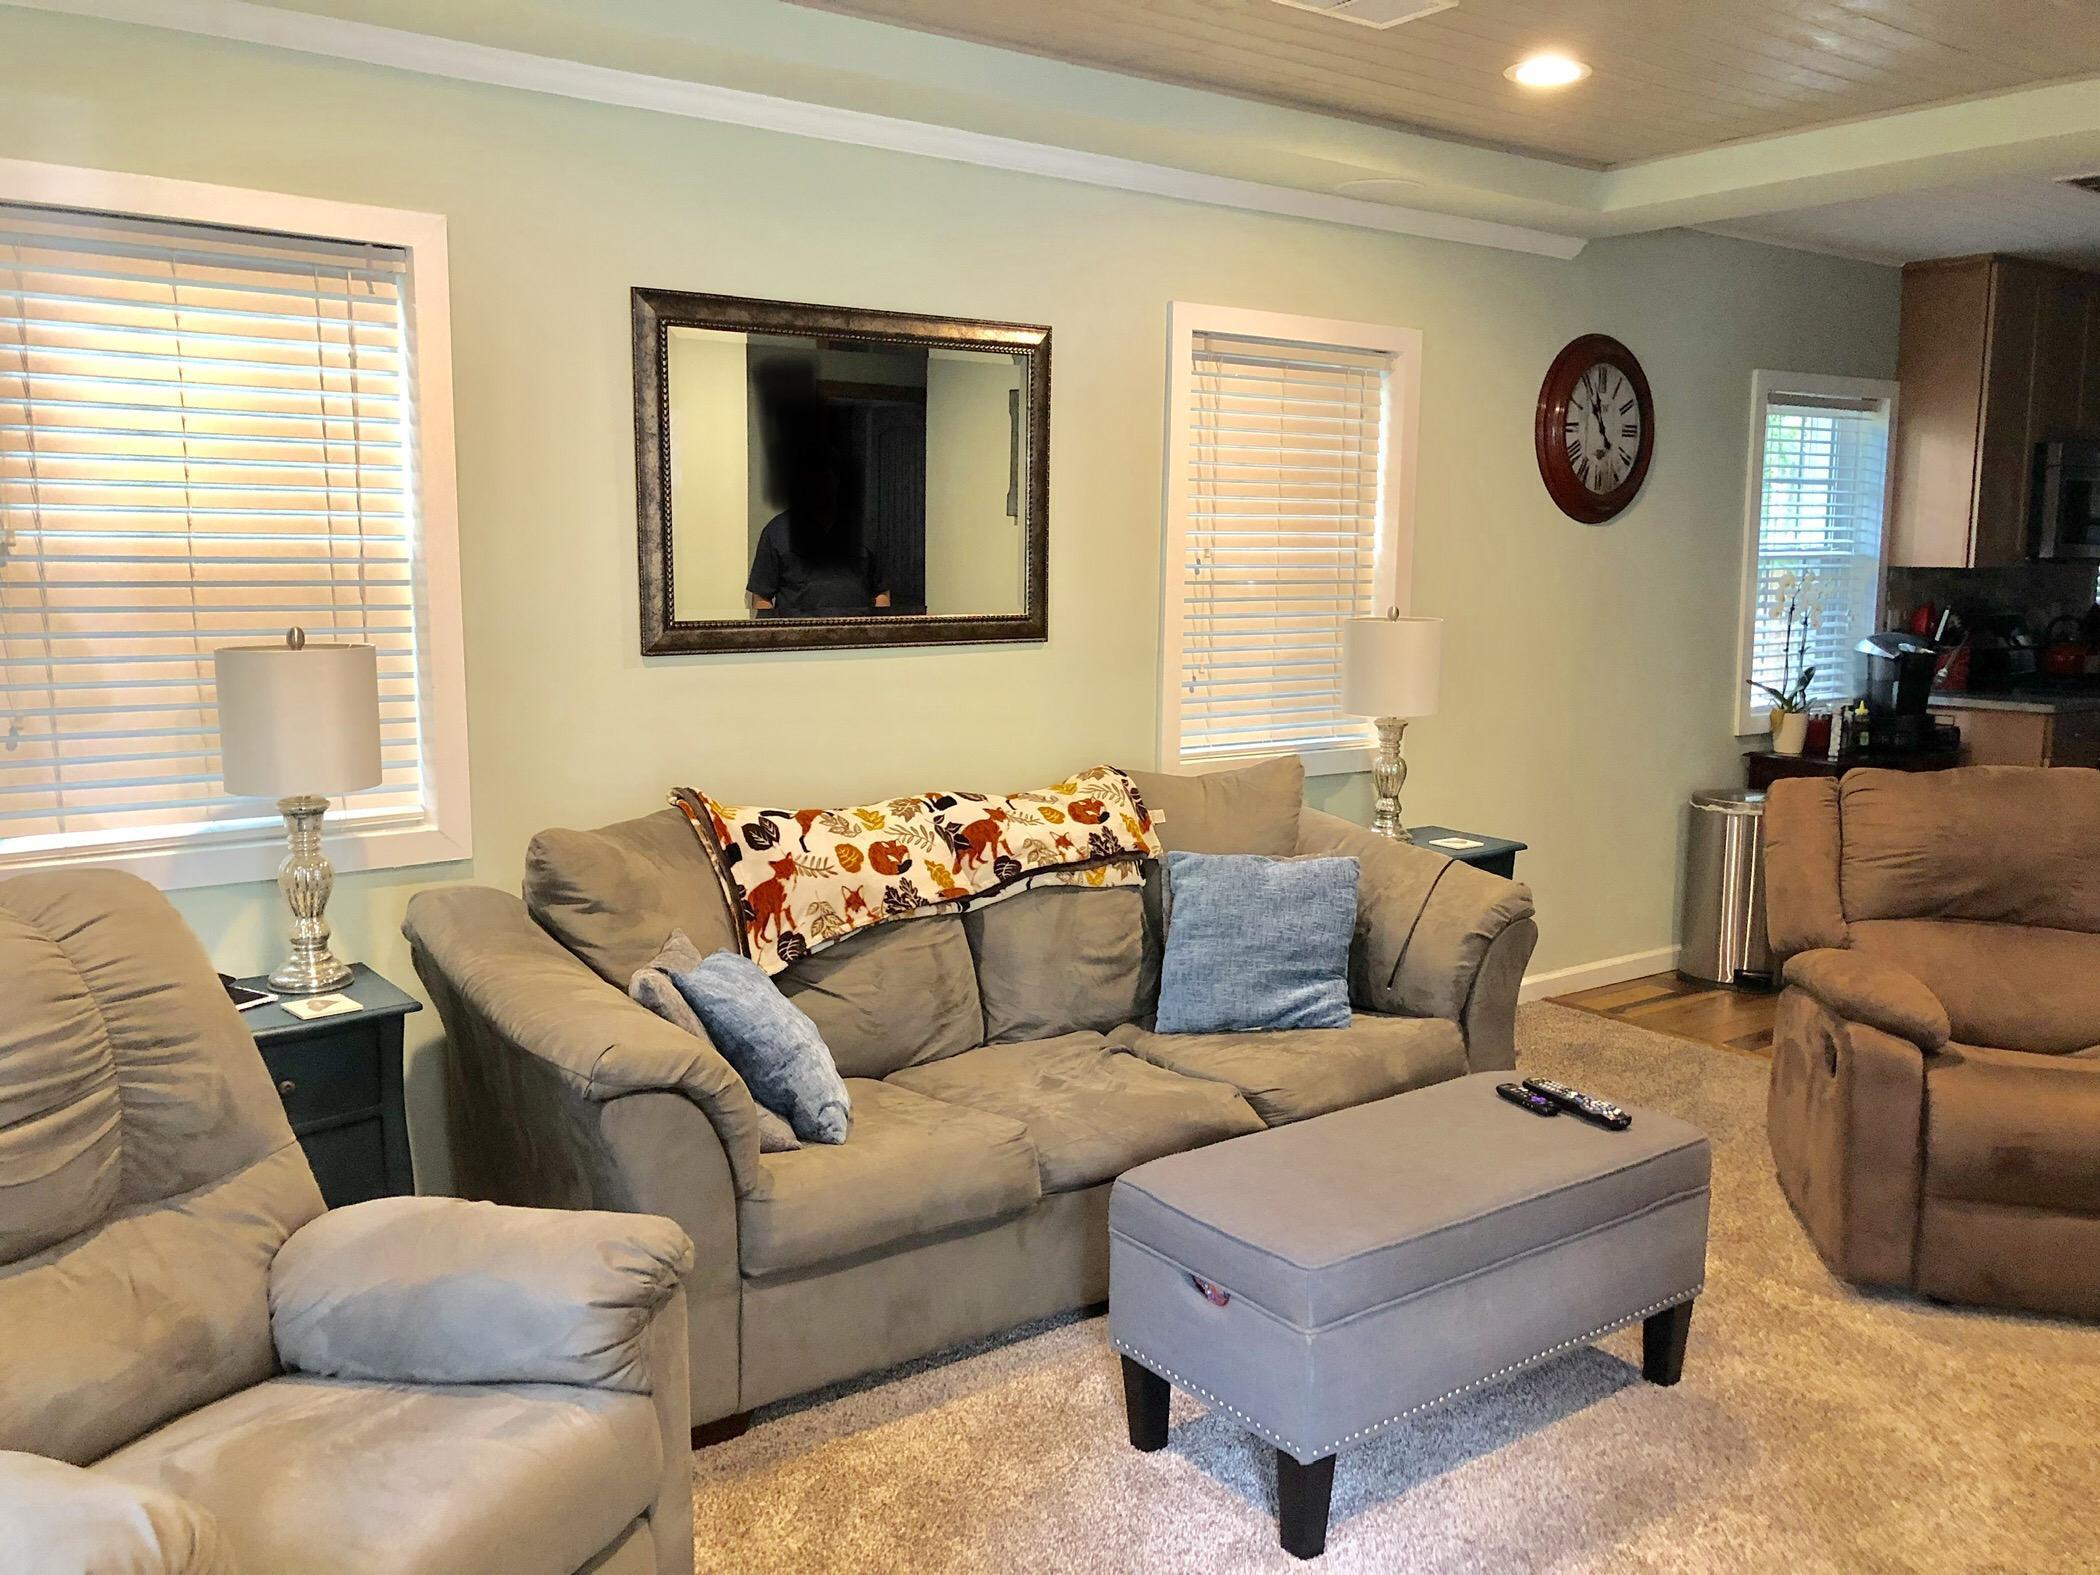 Pinecrest Gardens Homes For Sale - 1715 Jessamine, Charleston, SC - 13